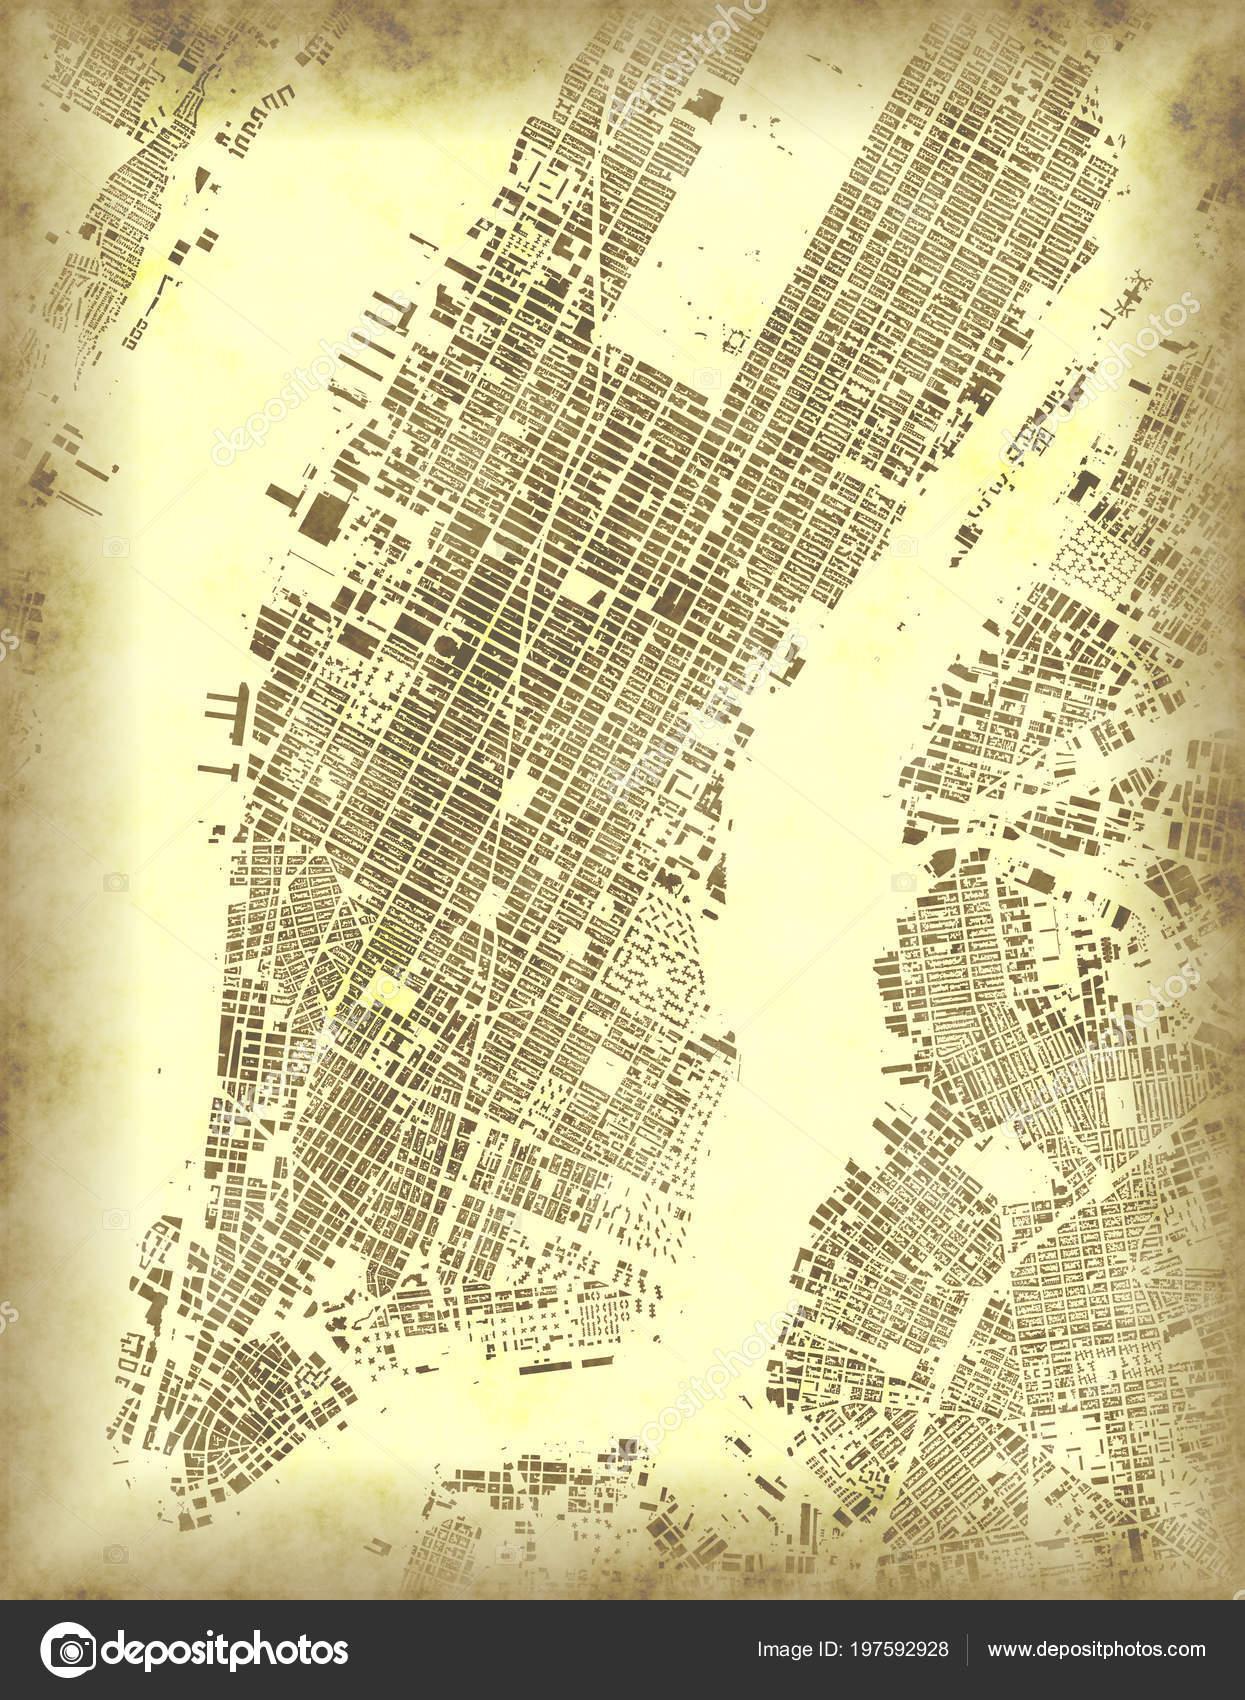 imágenes: satelital de manhattan   nueva york mapa vista